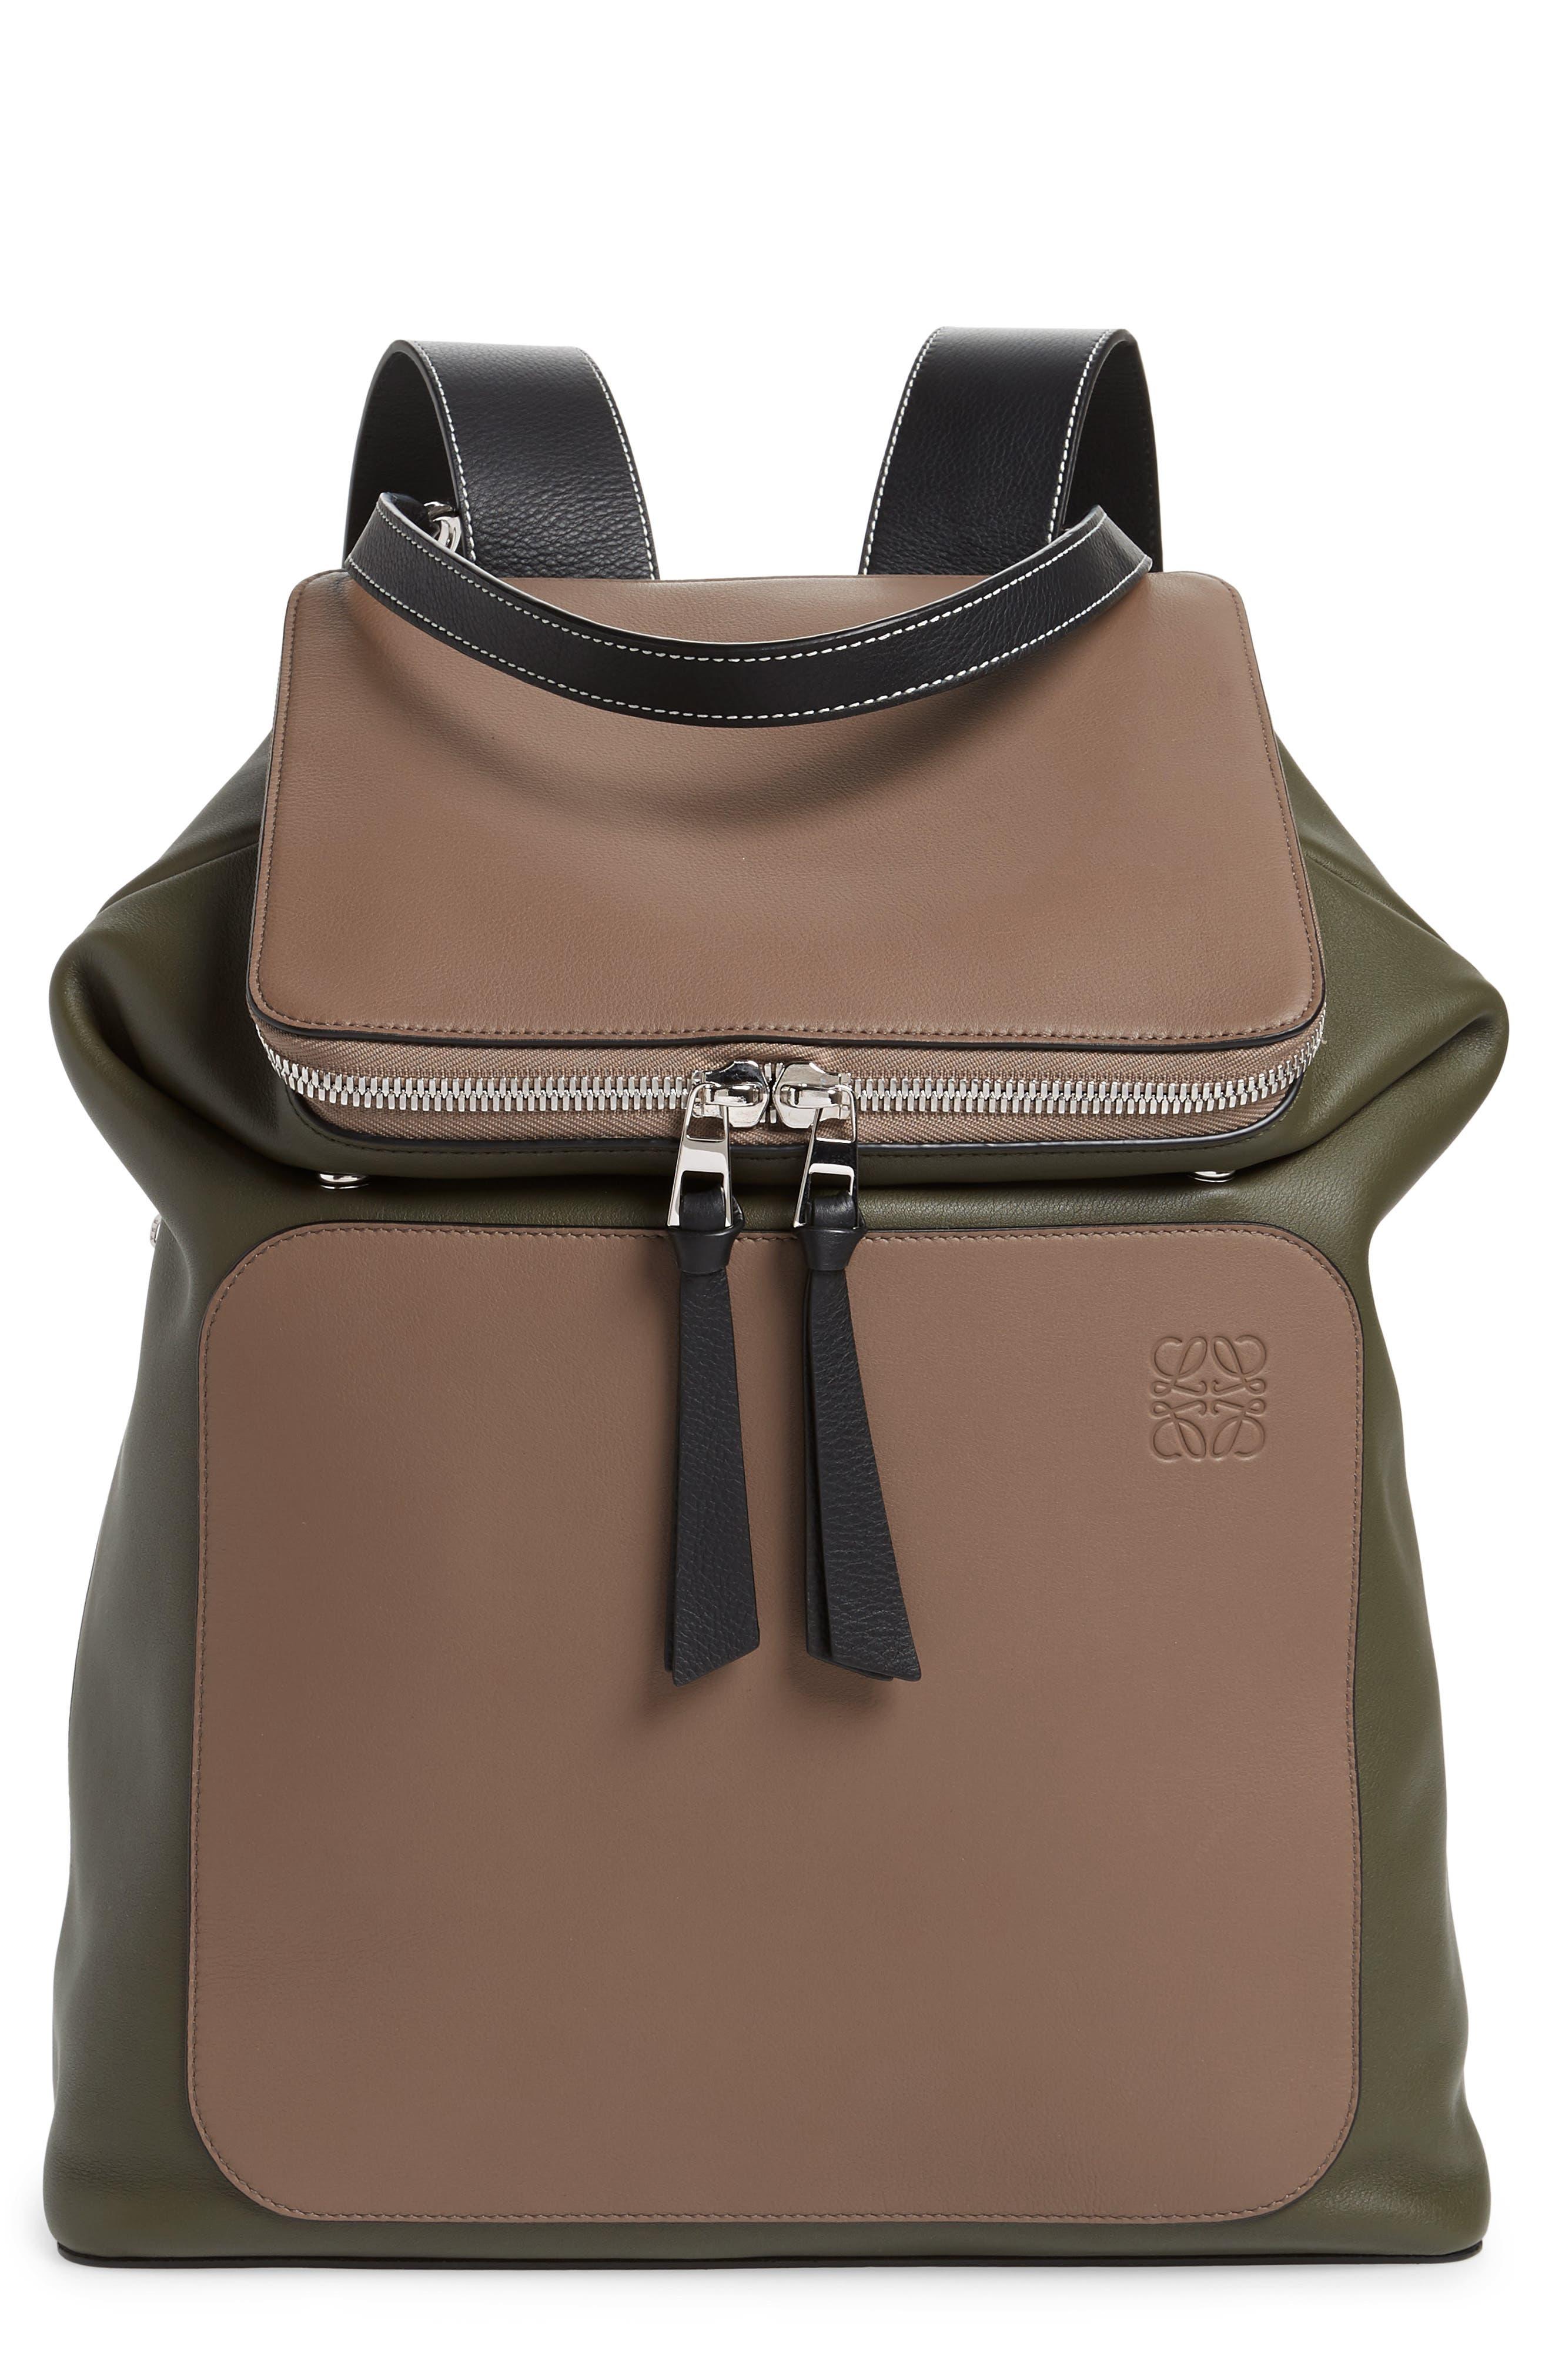 Buy loewe bags for men - Best men s loewe bags shop - Cools.com 26986397f9b84